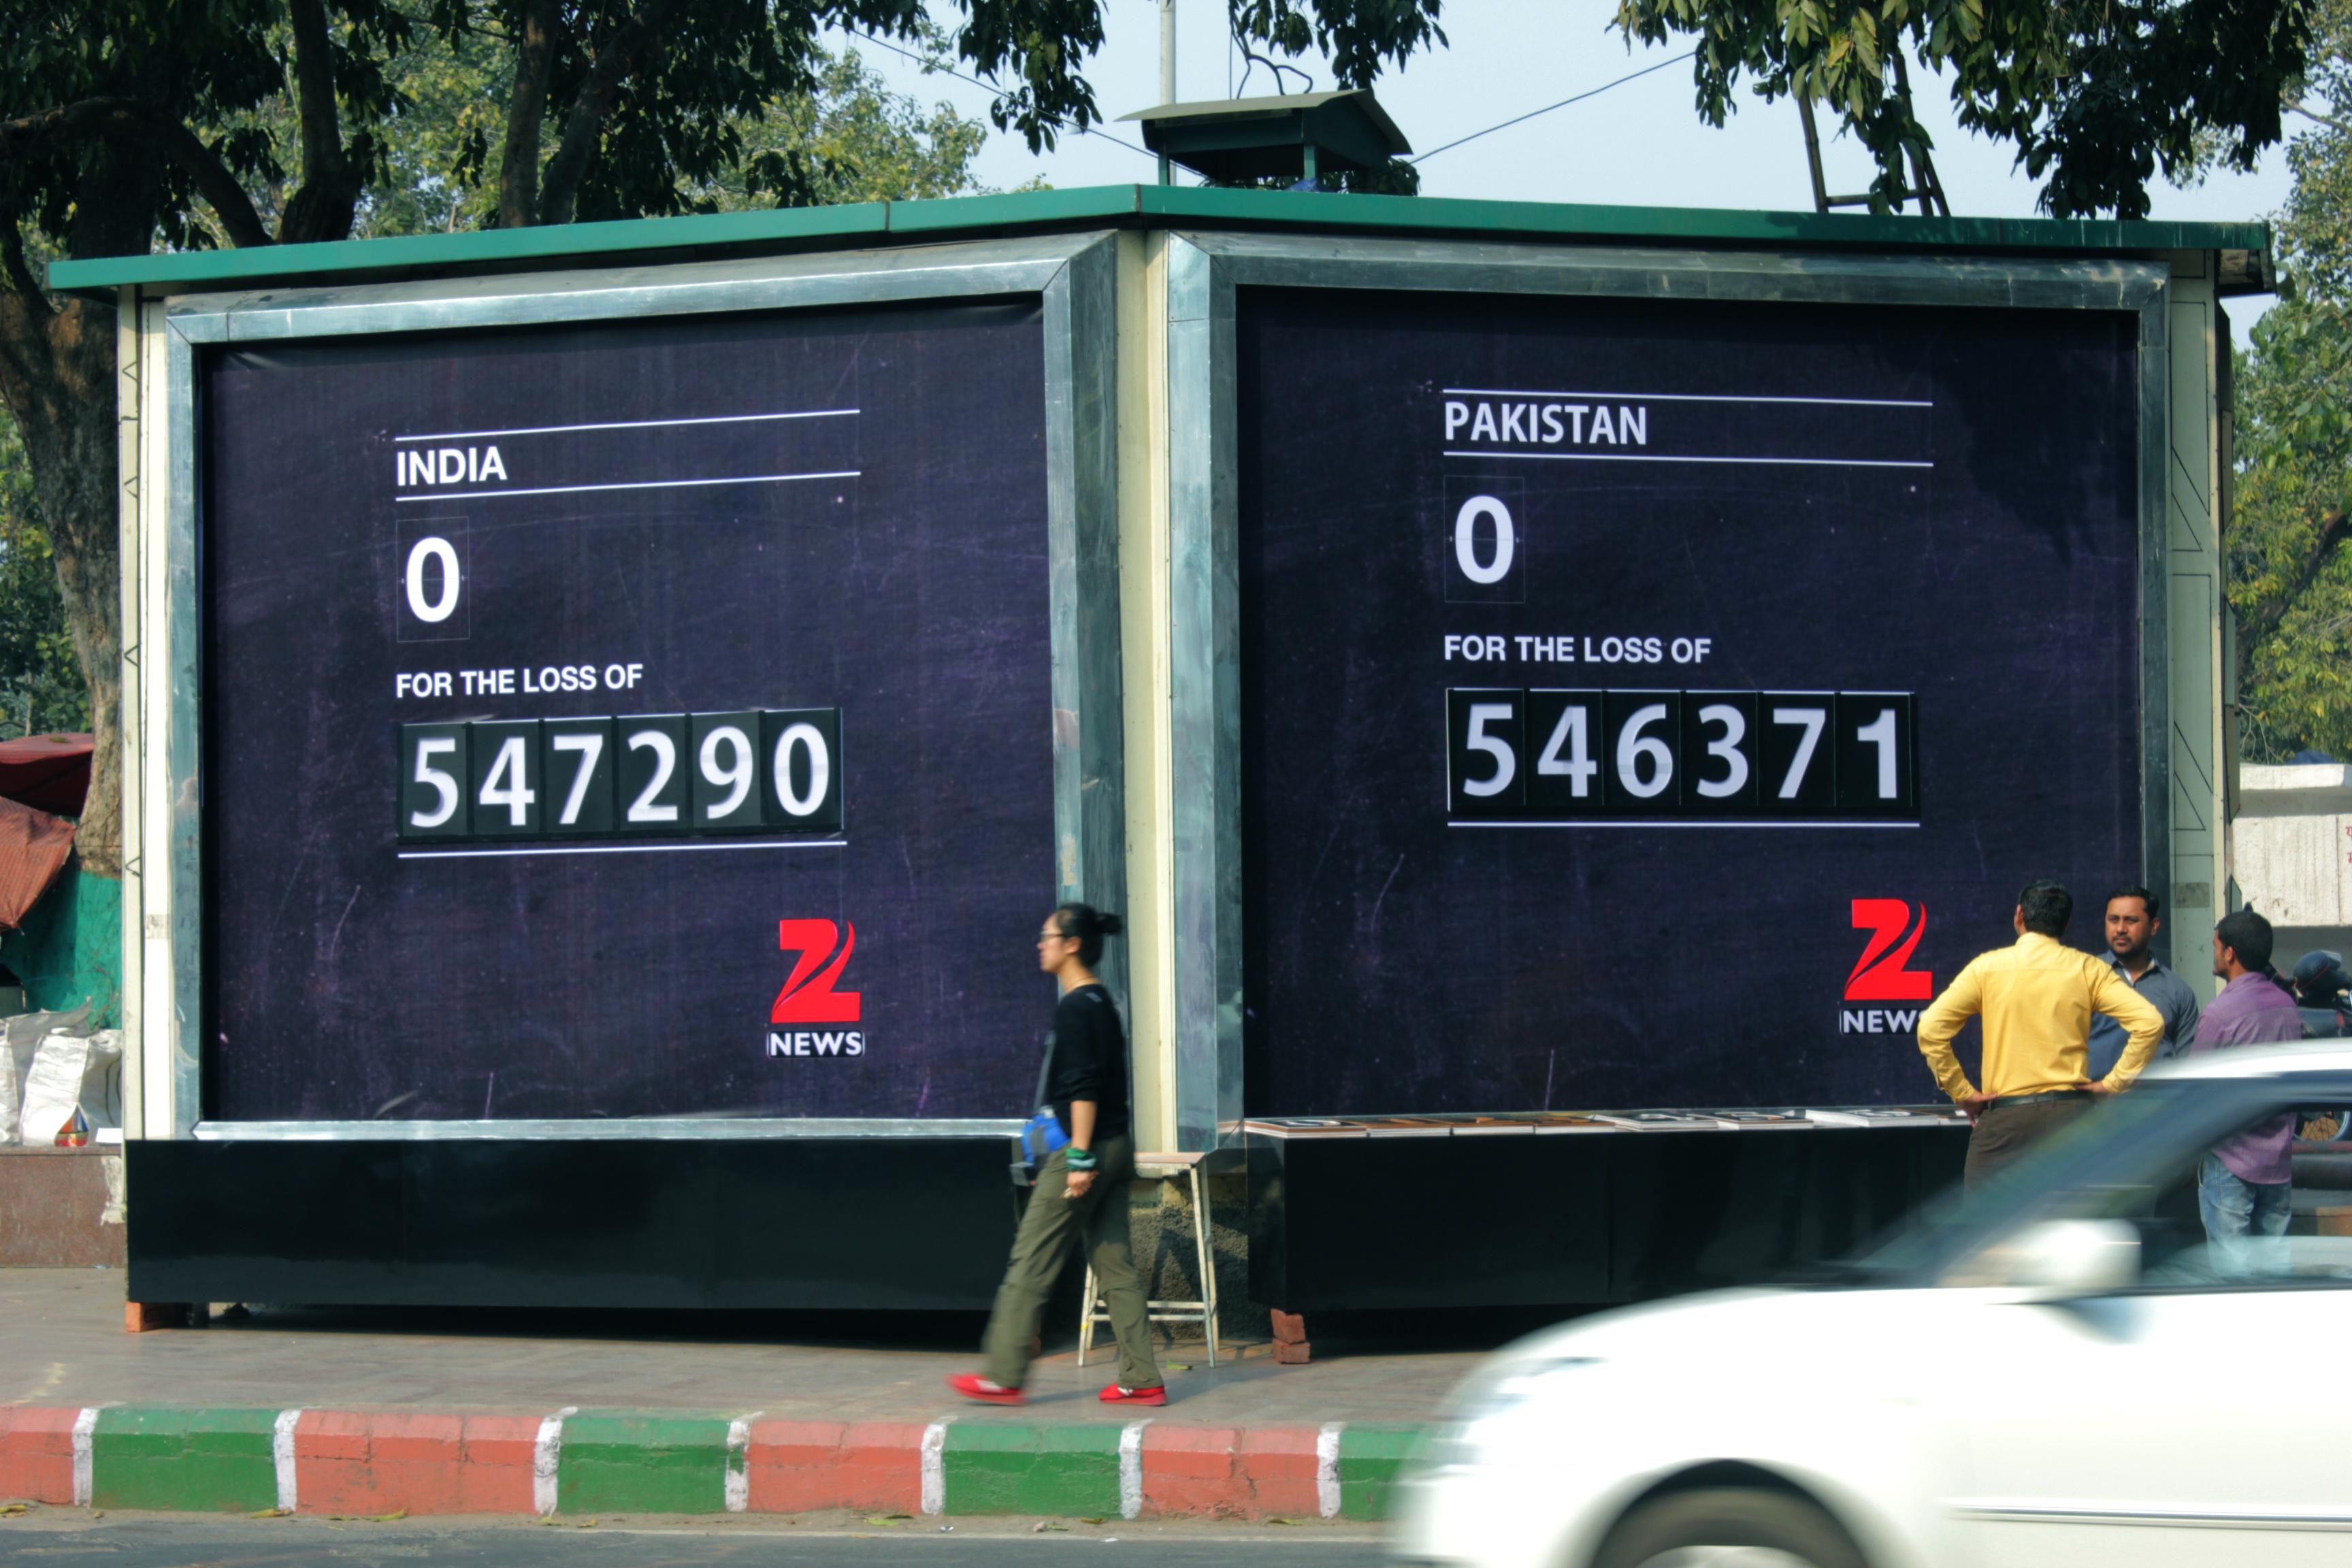 DDB MudraMax-OOH and Zee News Create A 'Misunderstood Scoreboard'